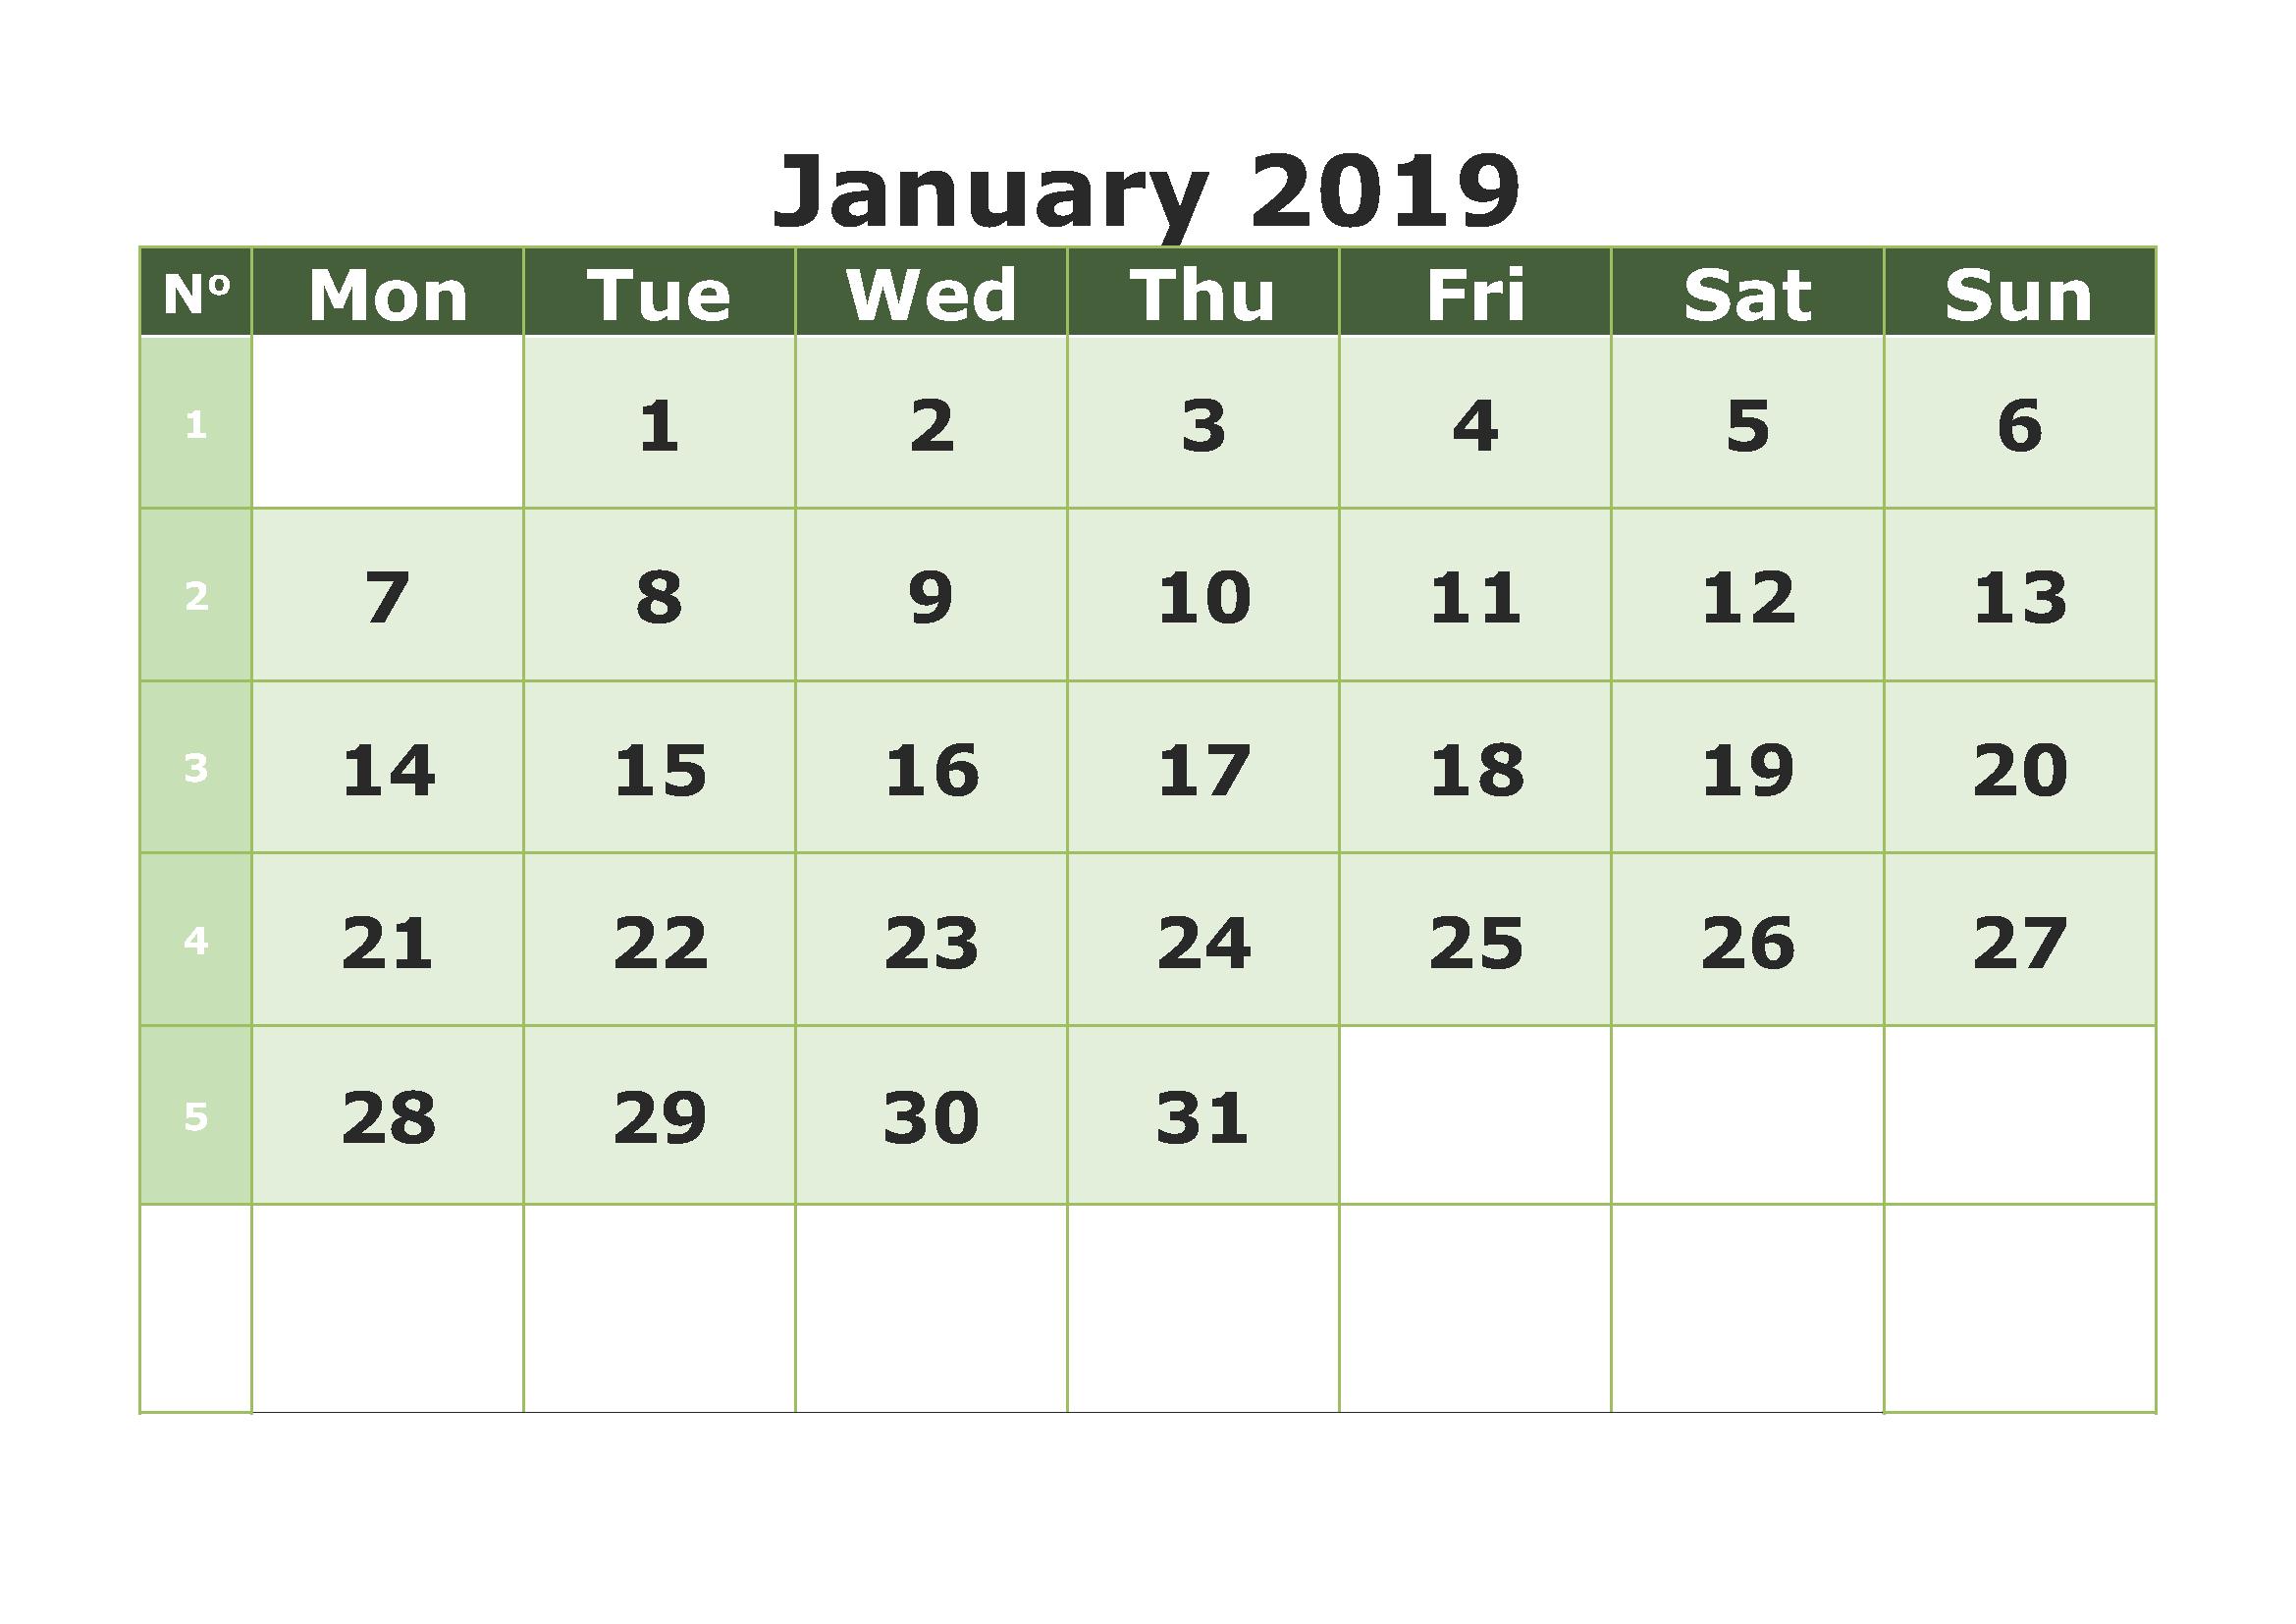 January 2019 Calendar Printable Cute